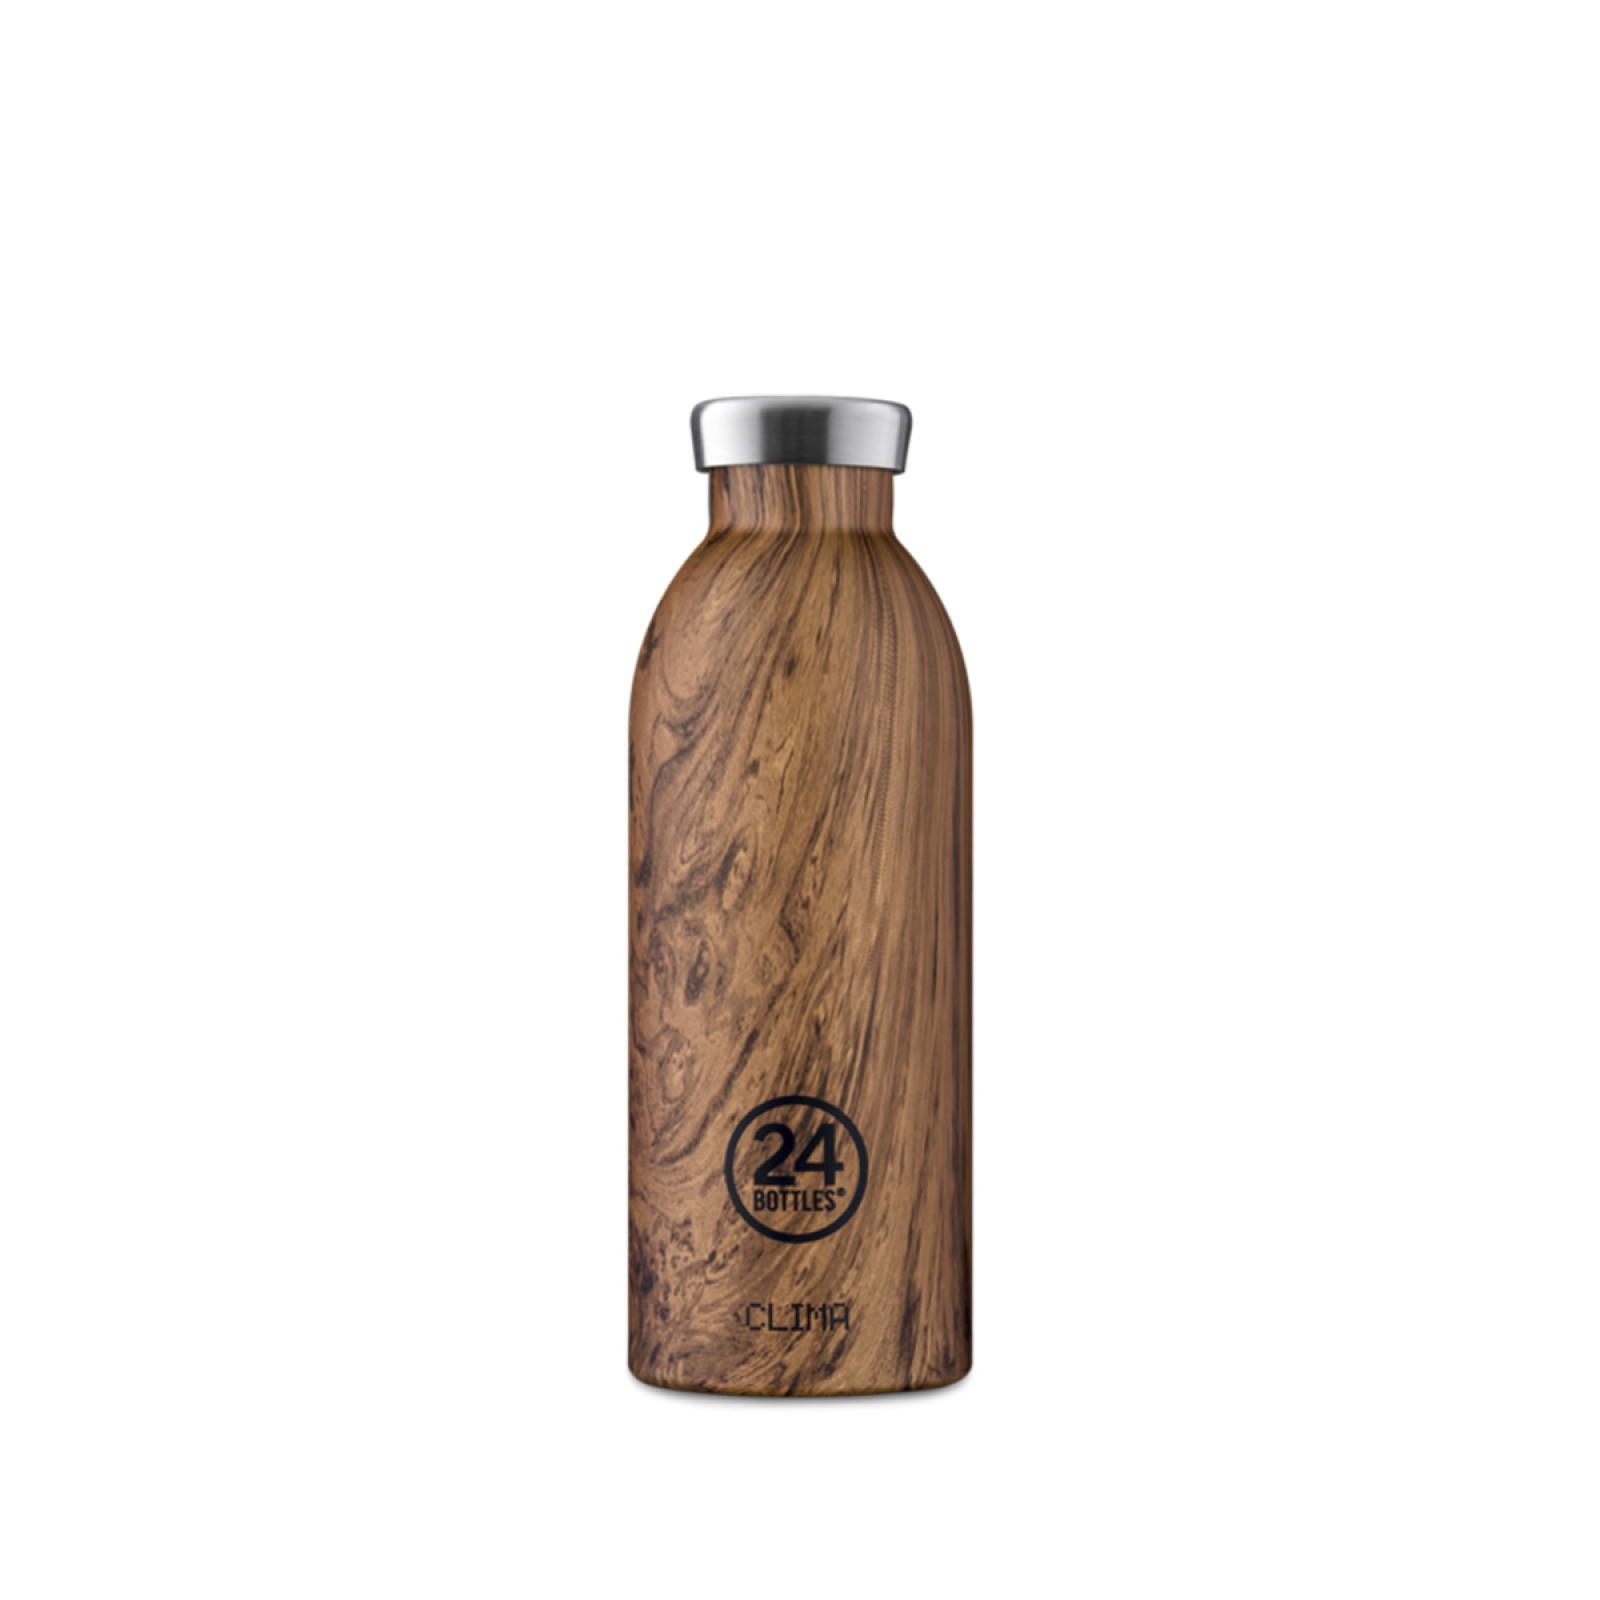 24 Bottles Clima Bottle Wood Sequoia 500 ml - 1